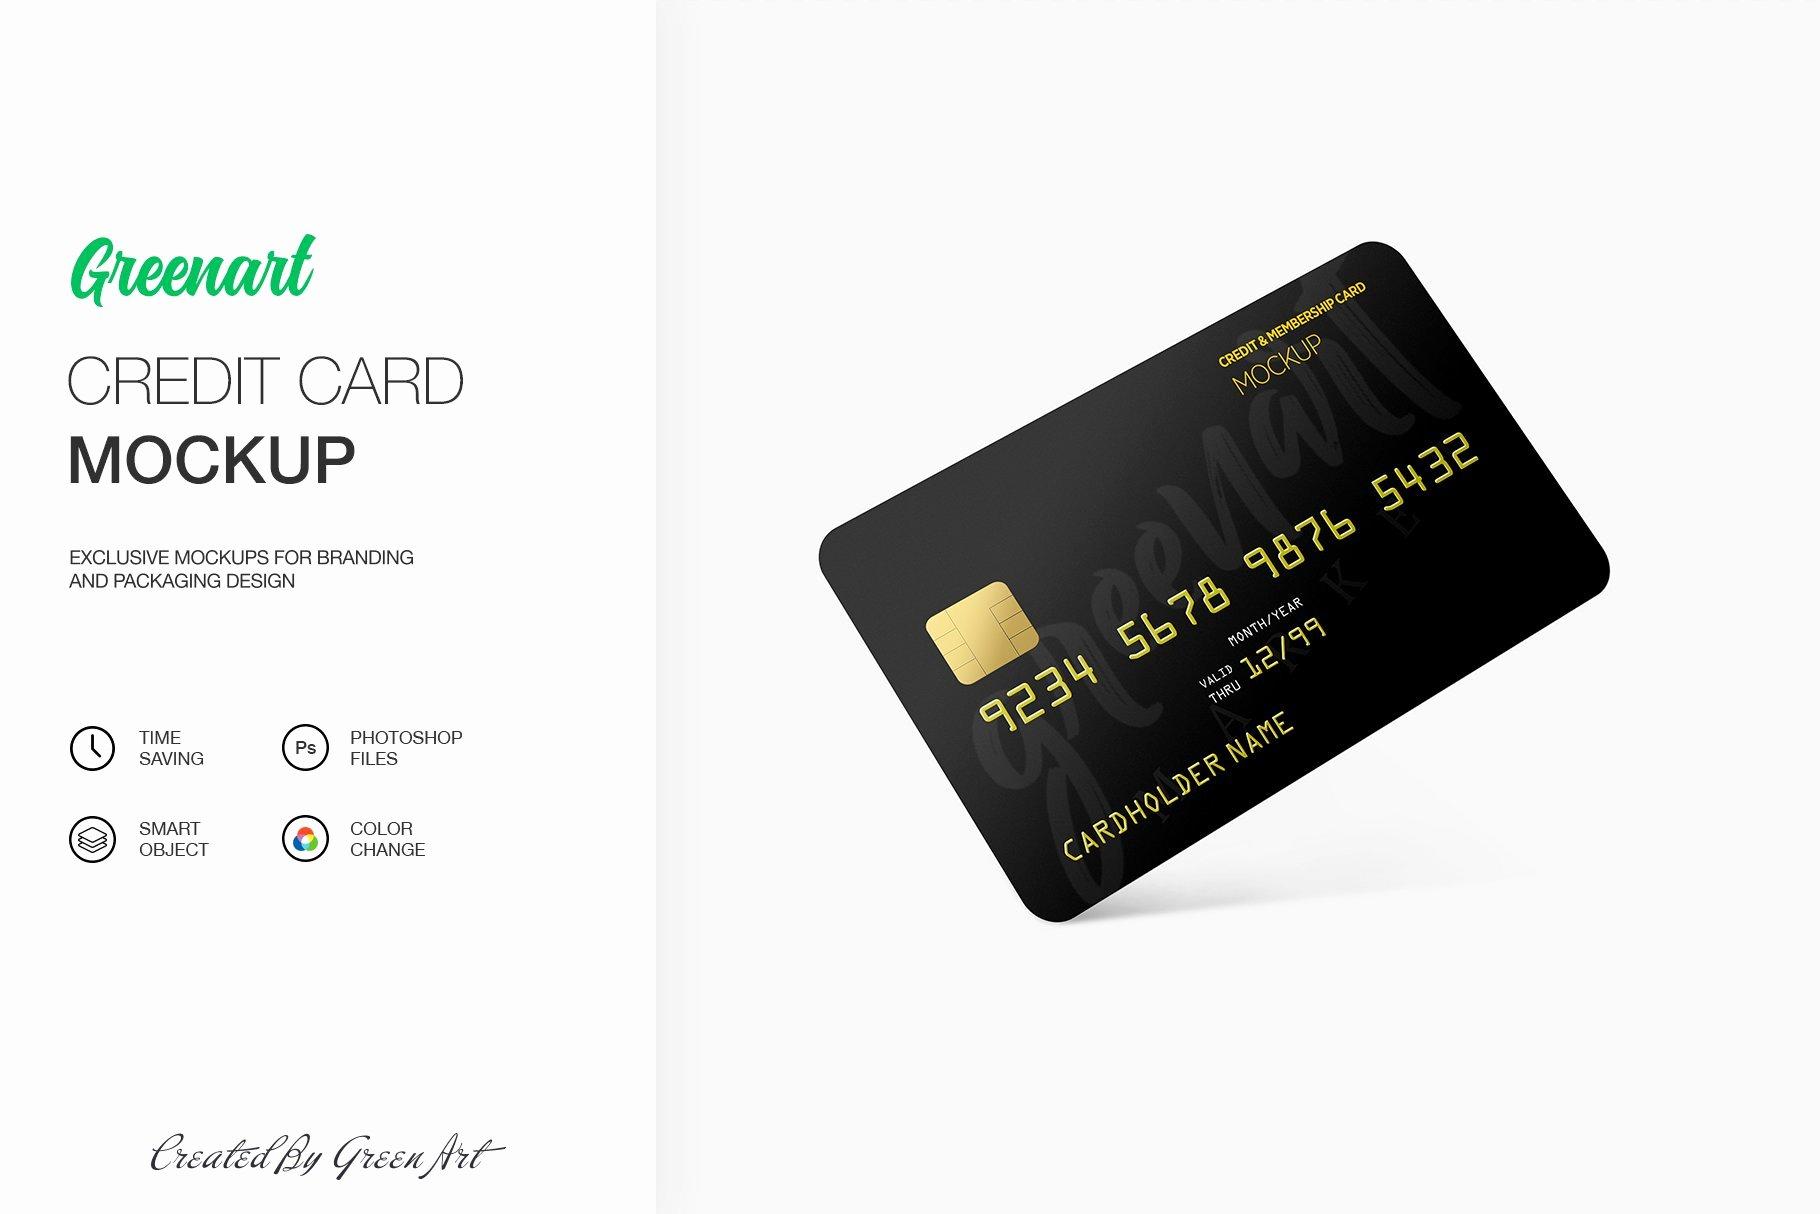 Credit Card Mockup Psd Best Of Credit Card Mockup Mockup Templates Creative Market